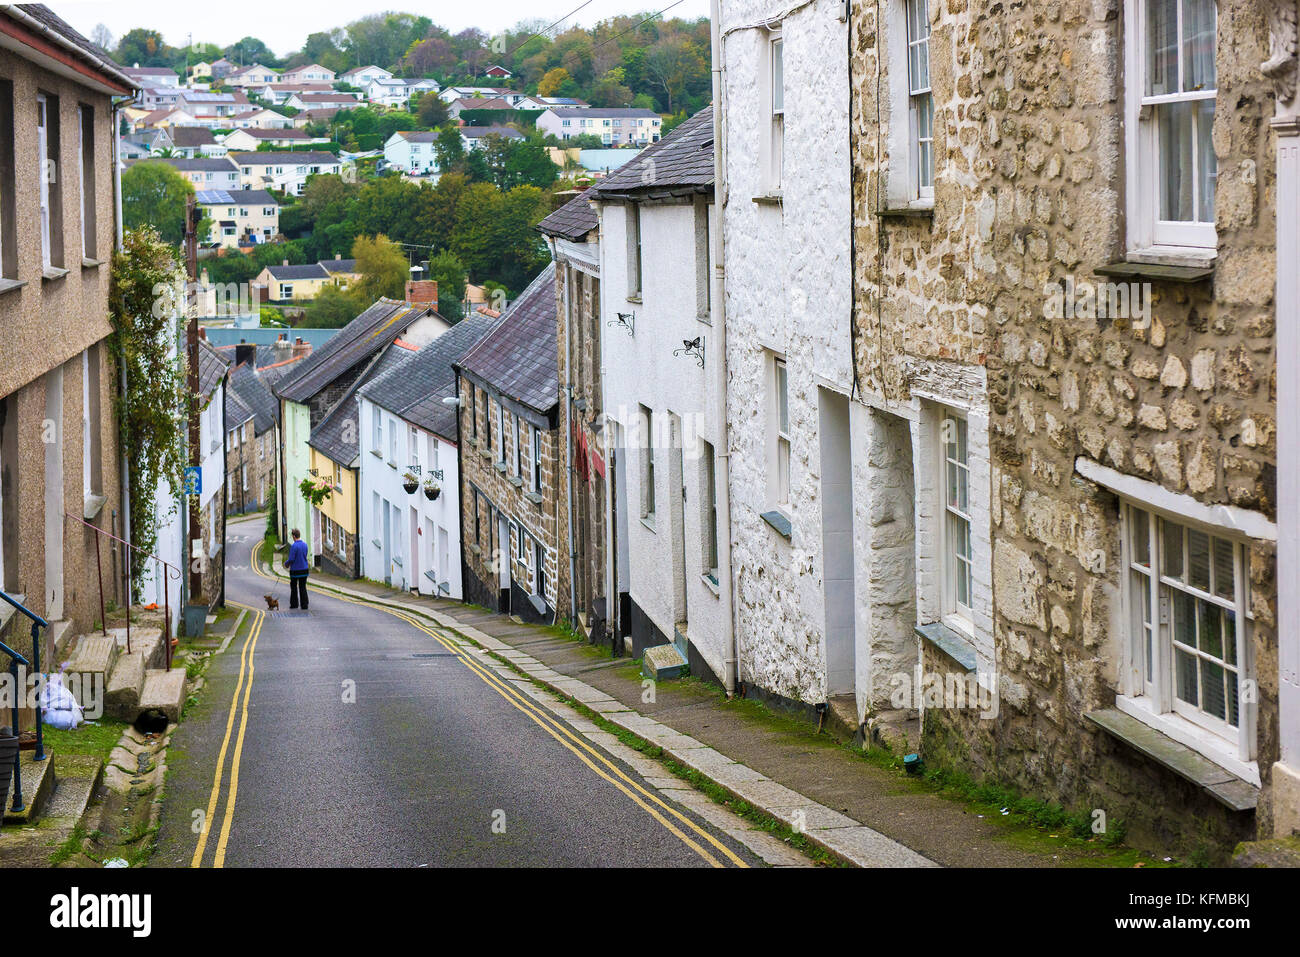 Quaint street - the quaint St Gluvias Street in Penryn in Cornwall. - Stock Image